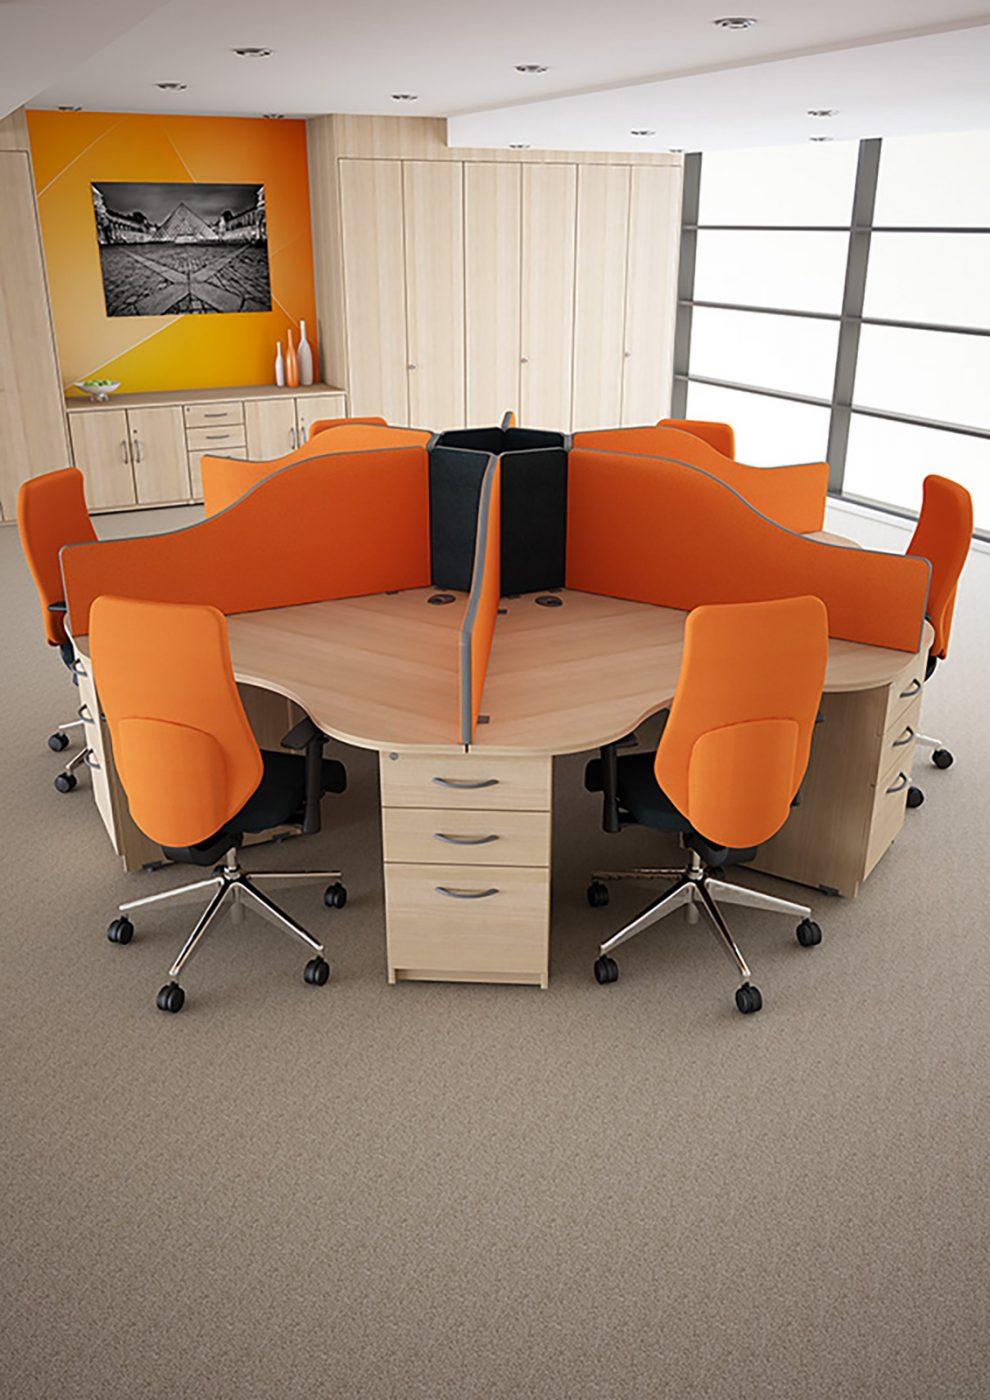 call centre, core unit, desktop screen, under desk ped, office furniture, call centre furniture